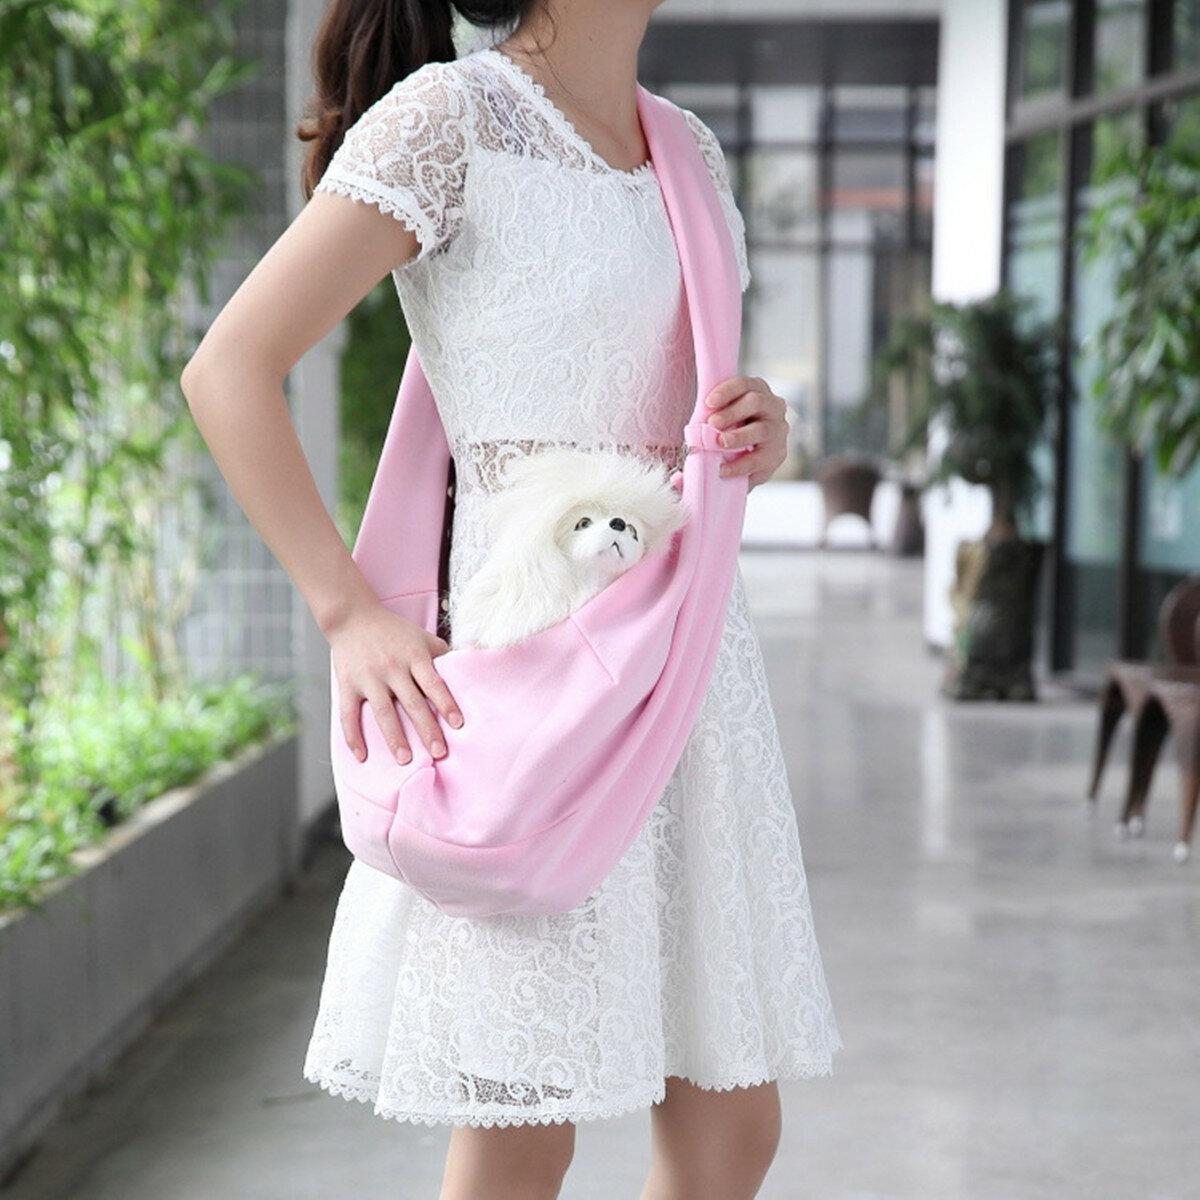 Solid Color Single Shoulder Pet Carrier Sling Bag Travel Bag for Cats Small Size Dogs